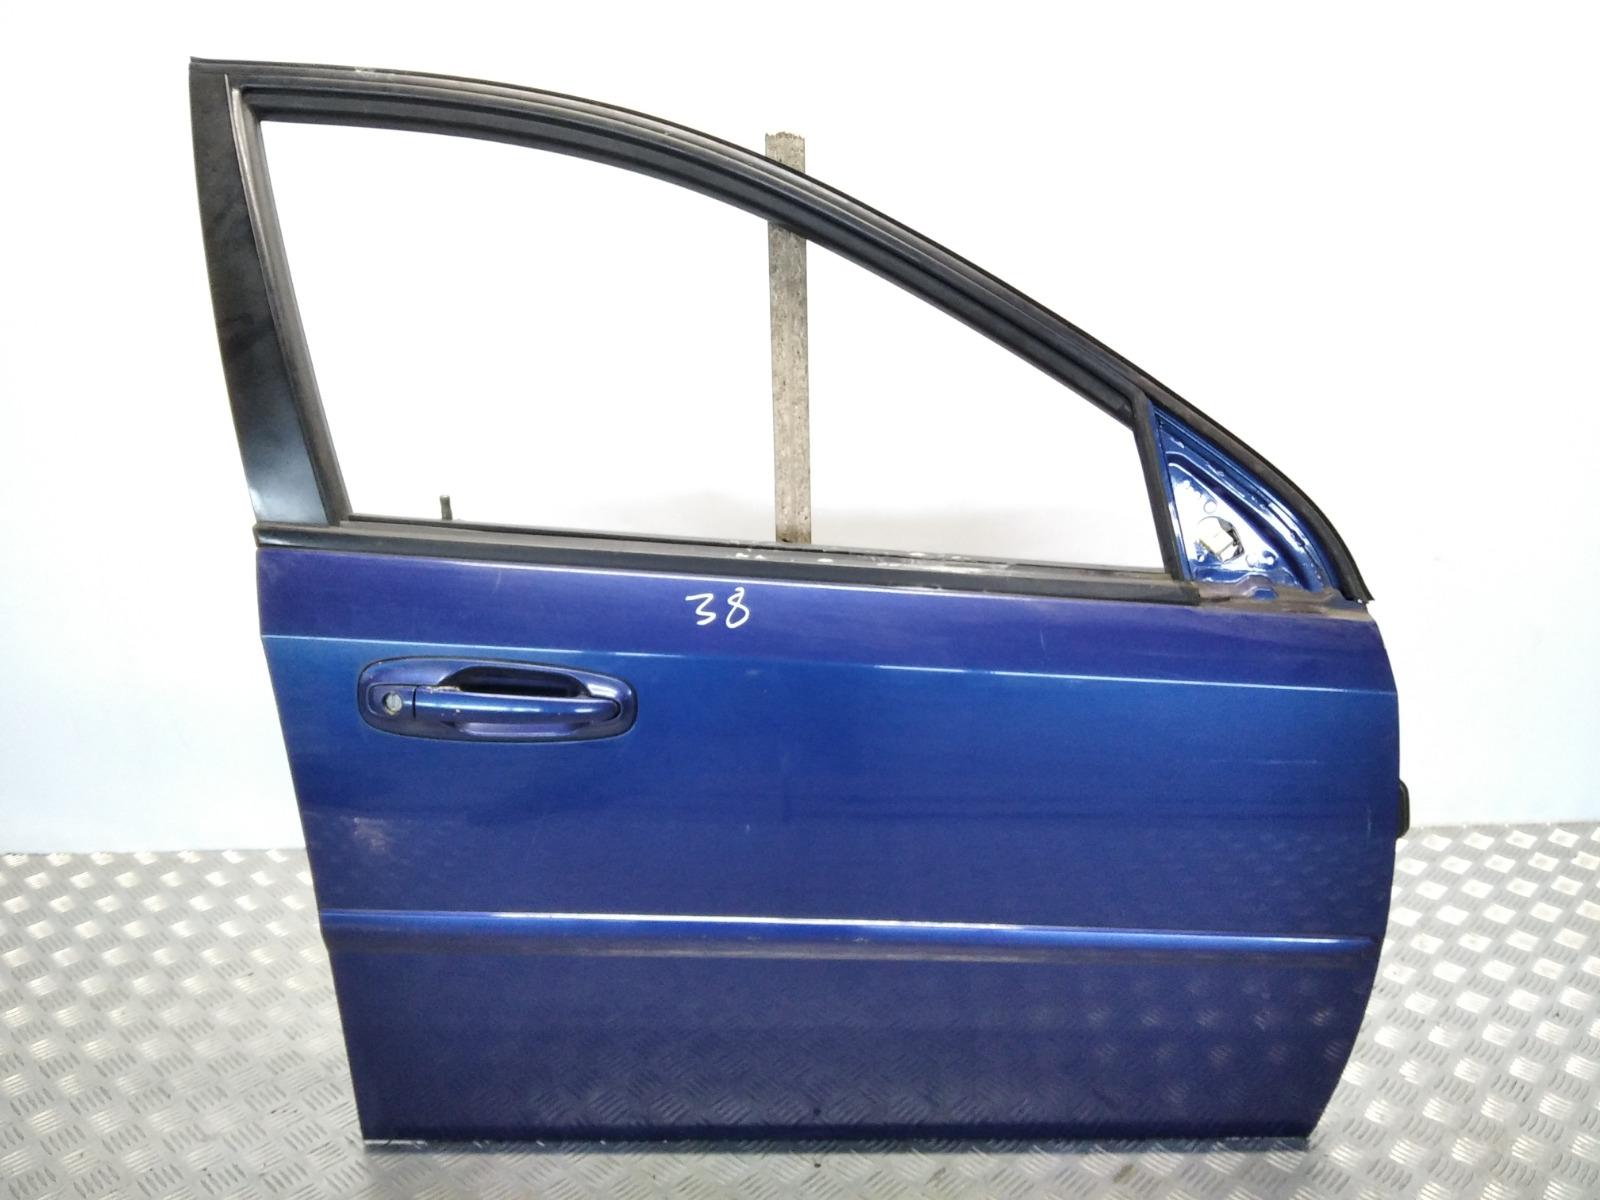 Дверь передняя правая Chevrolet Lacetti 1.6 I 2006 (б/у)